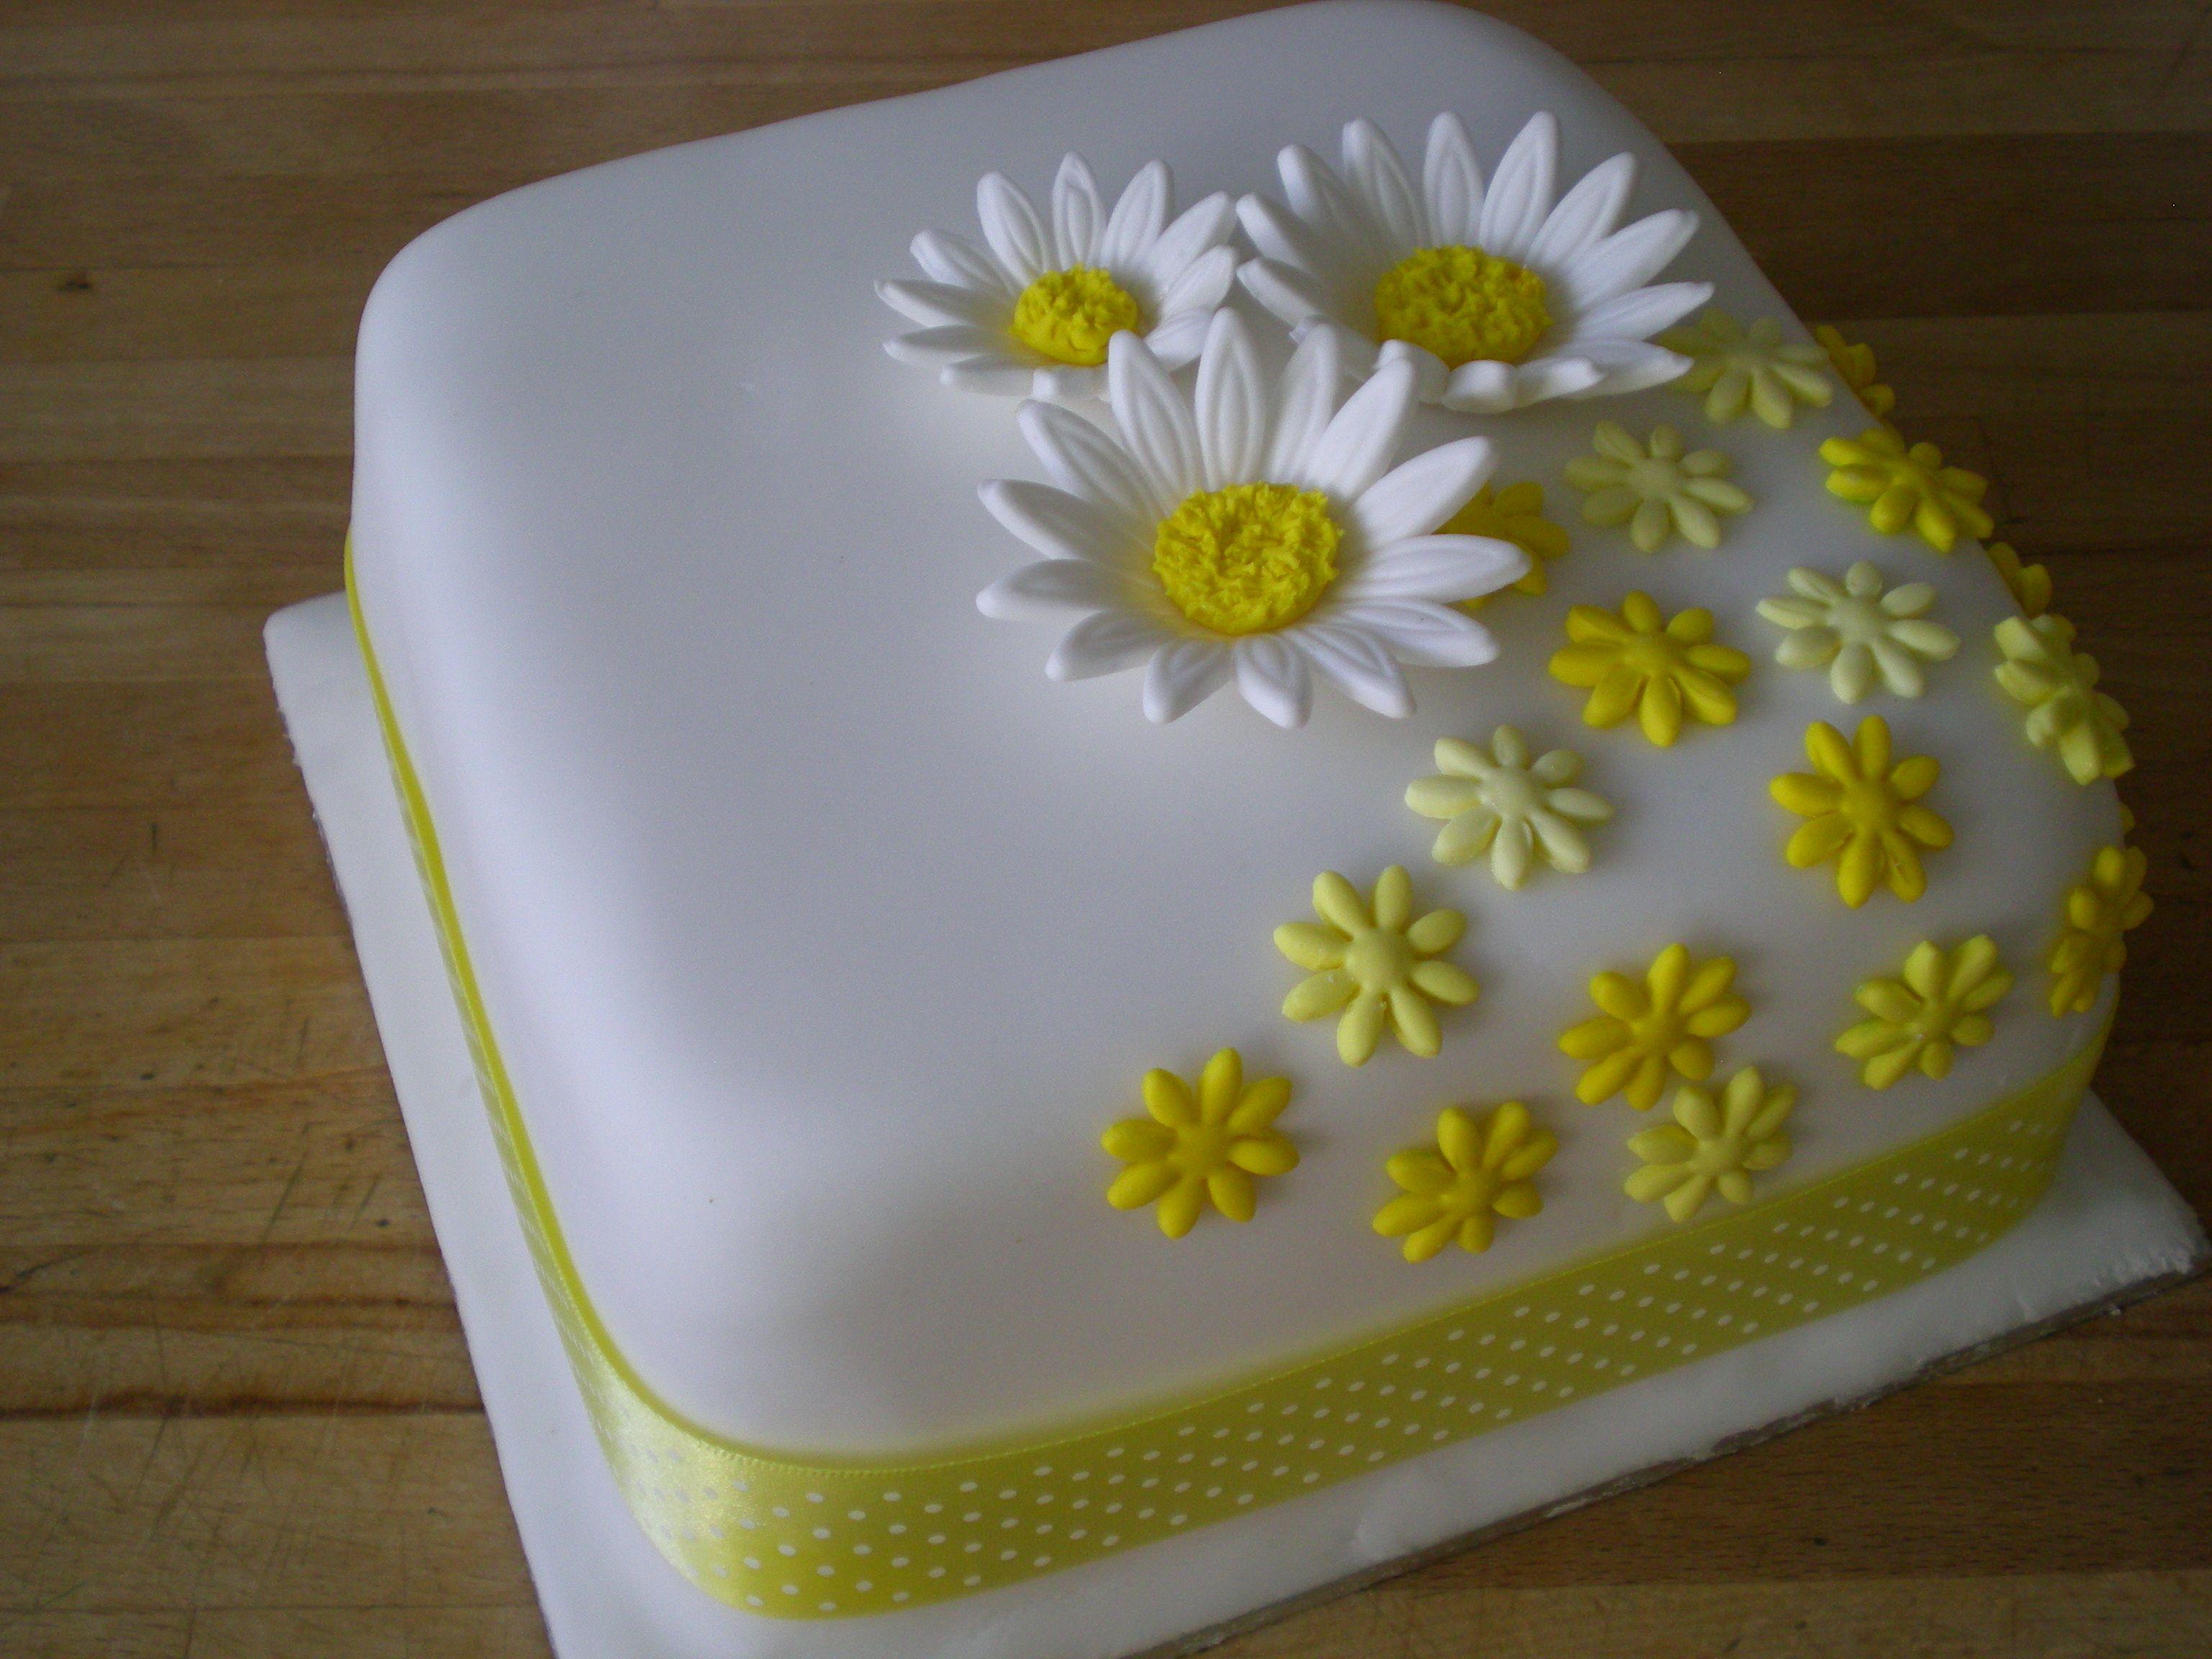 Awe Inspiring Daisy Birthday Cake Birthday Cakes For Women Birthday Cake Funny Birthday Cards Online Elaedamsfinfo